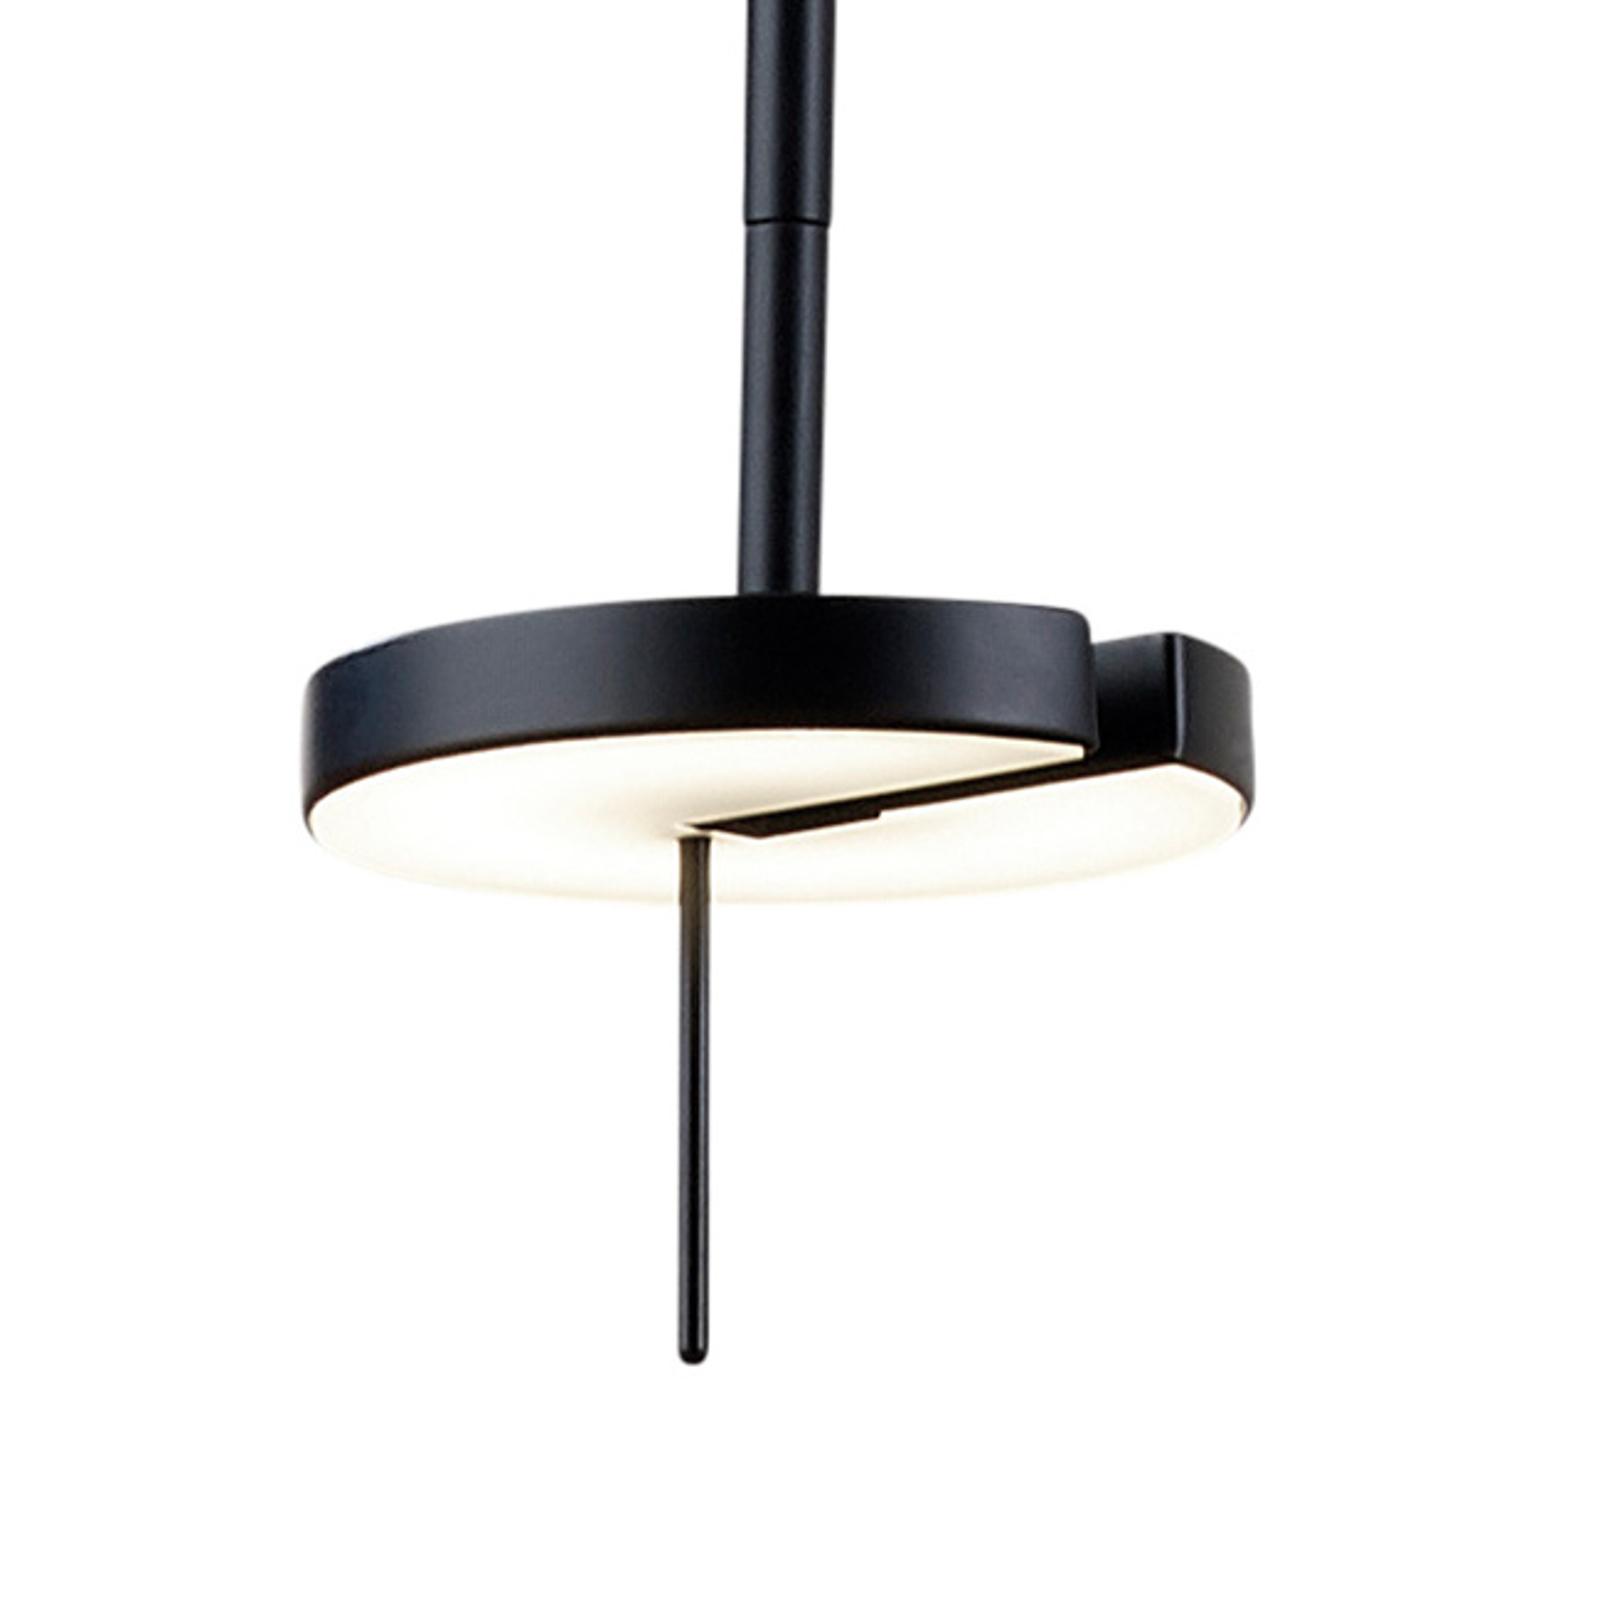 Grok Invisible lampa wisząca LED 00-5693, Ø 15cm